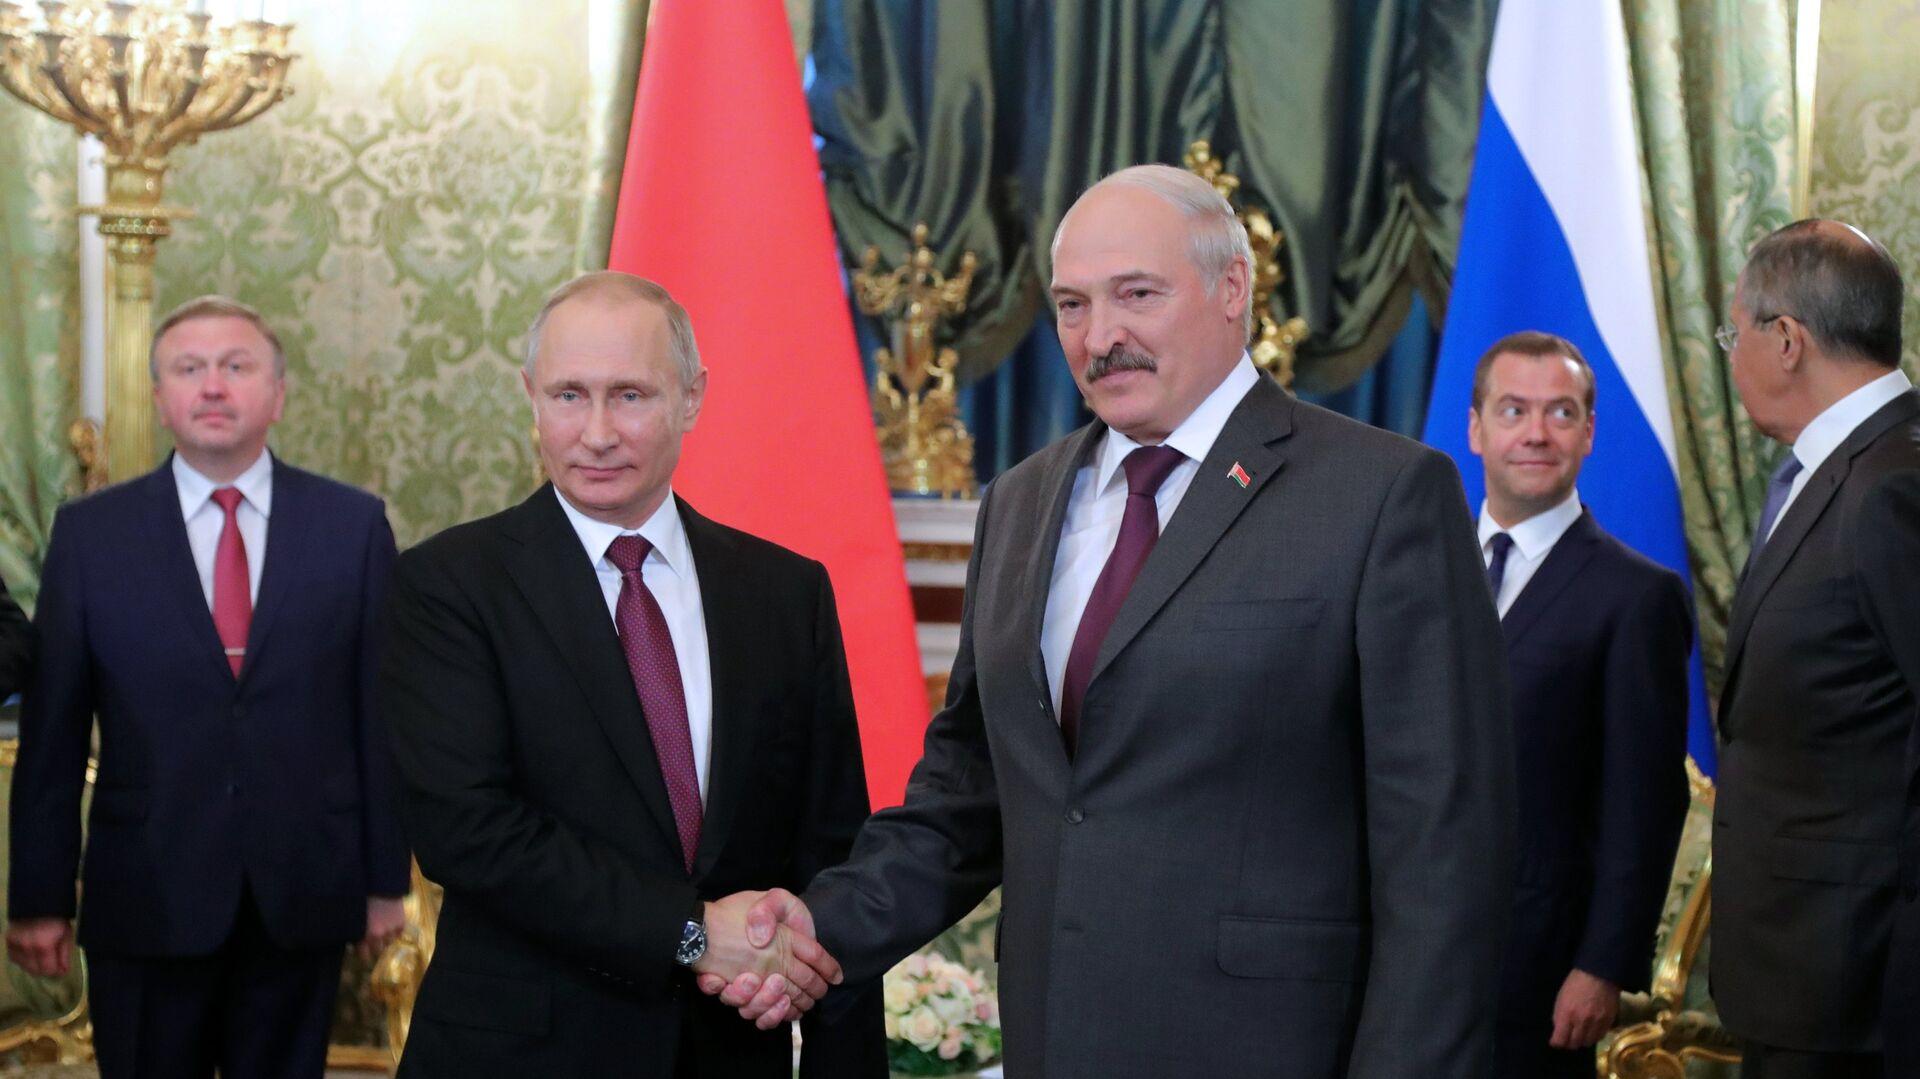 Presidente de Rusia, Vladímir Putin, presidente de Bielorrusia, Alexandr Lukashenko - Sputnik Mundo, 1920, 01.07.2021